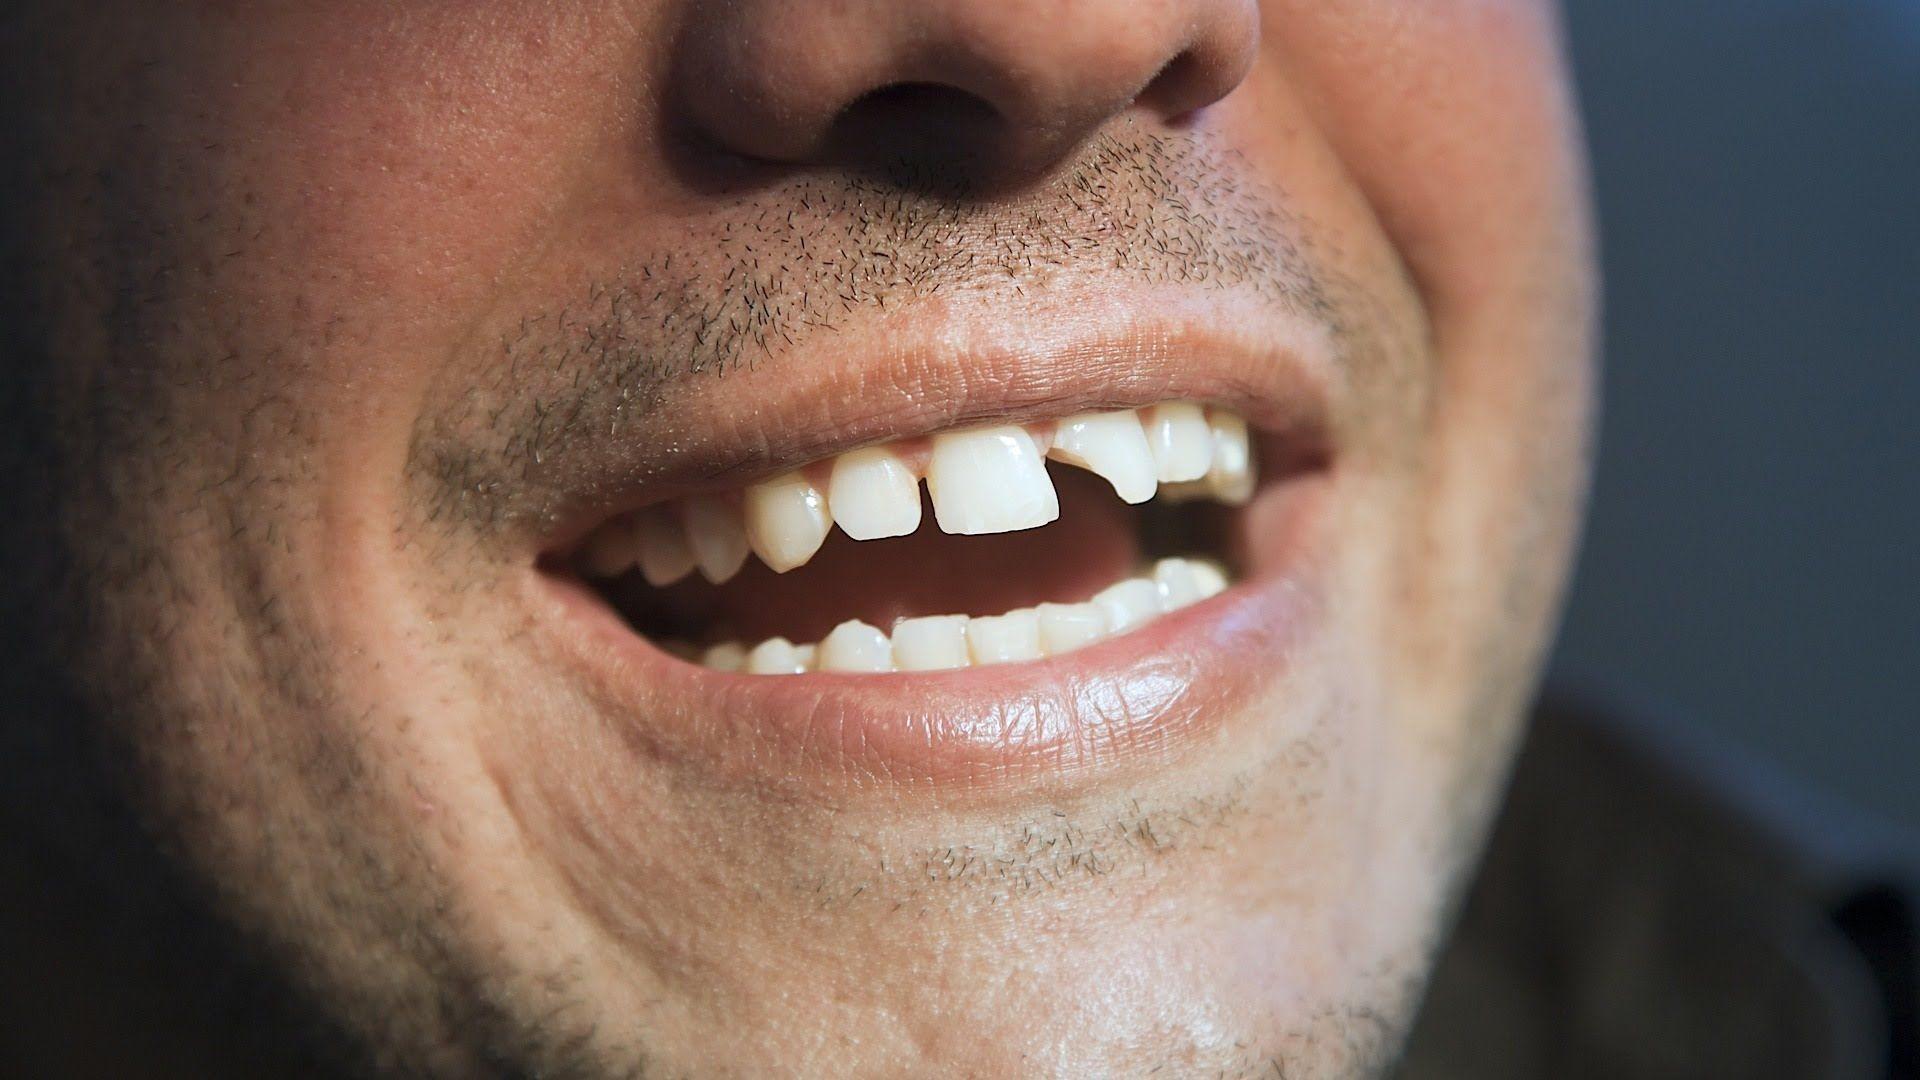 broken tooth Broken tooth, Dental bonding, Teeth care